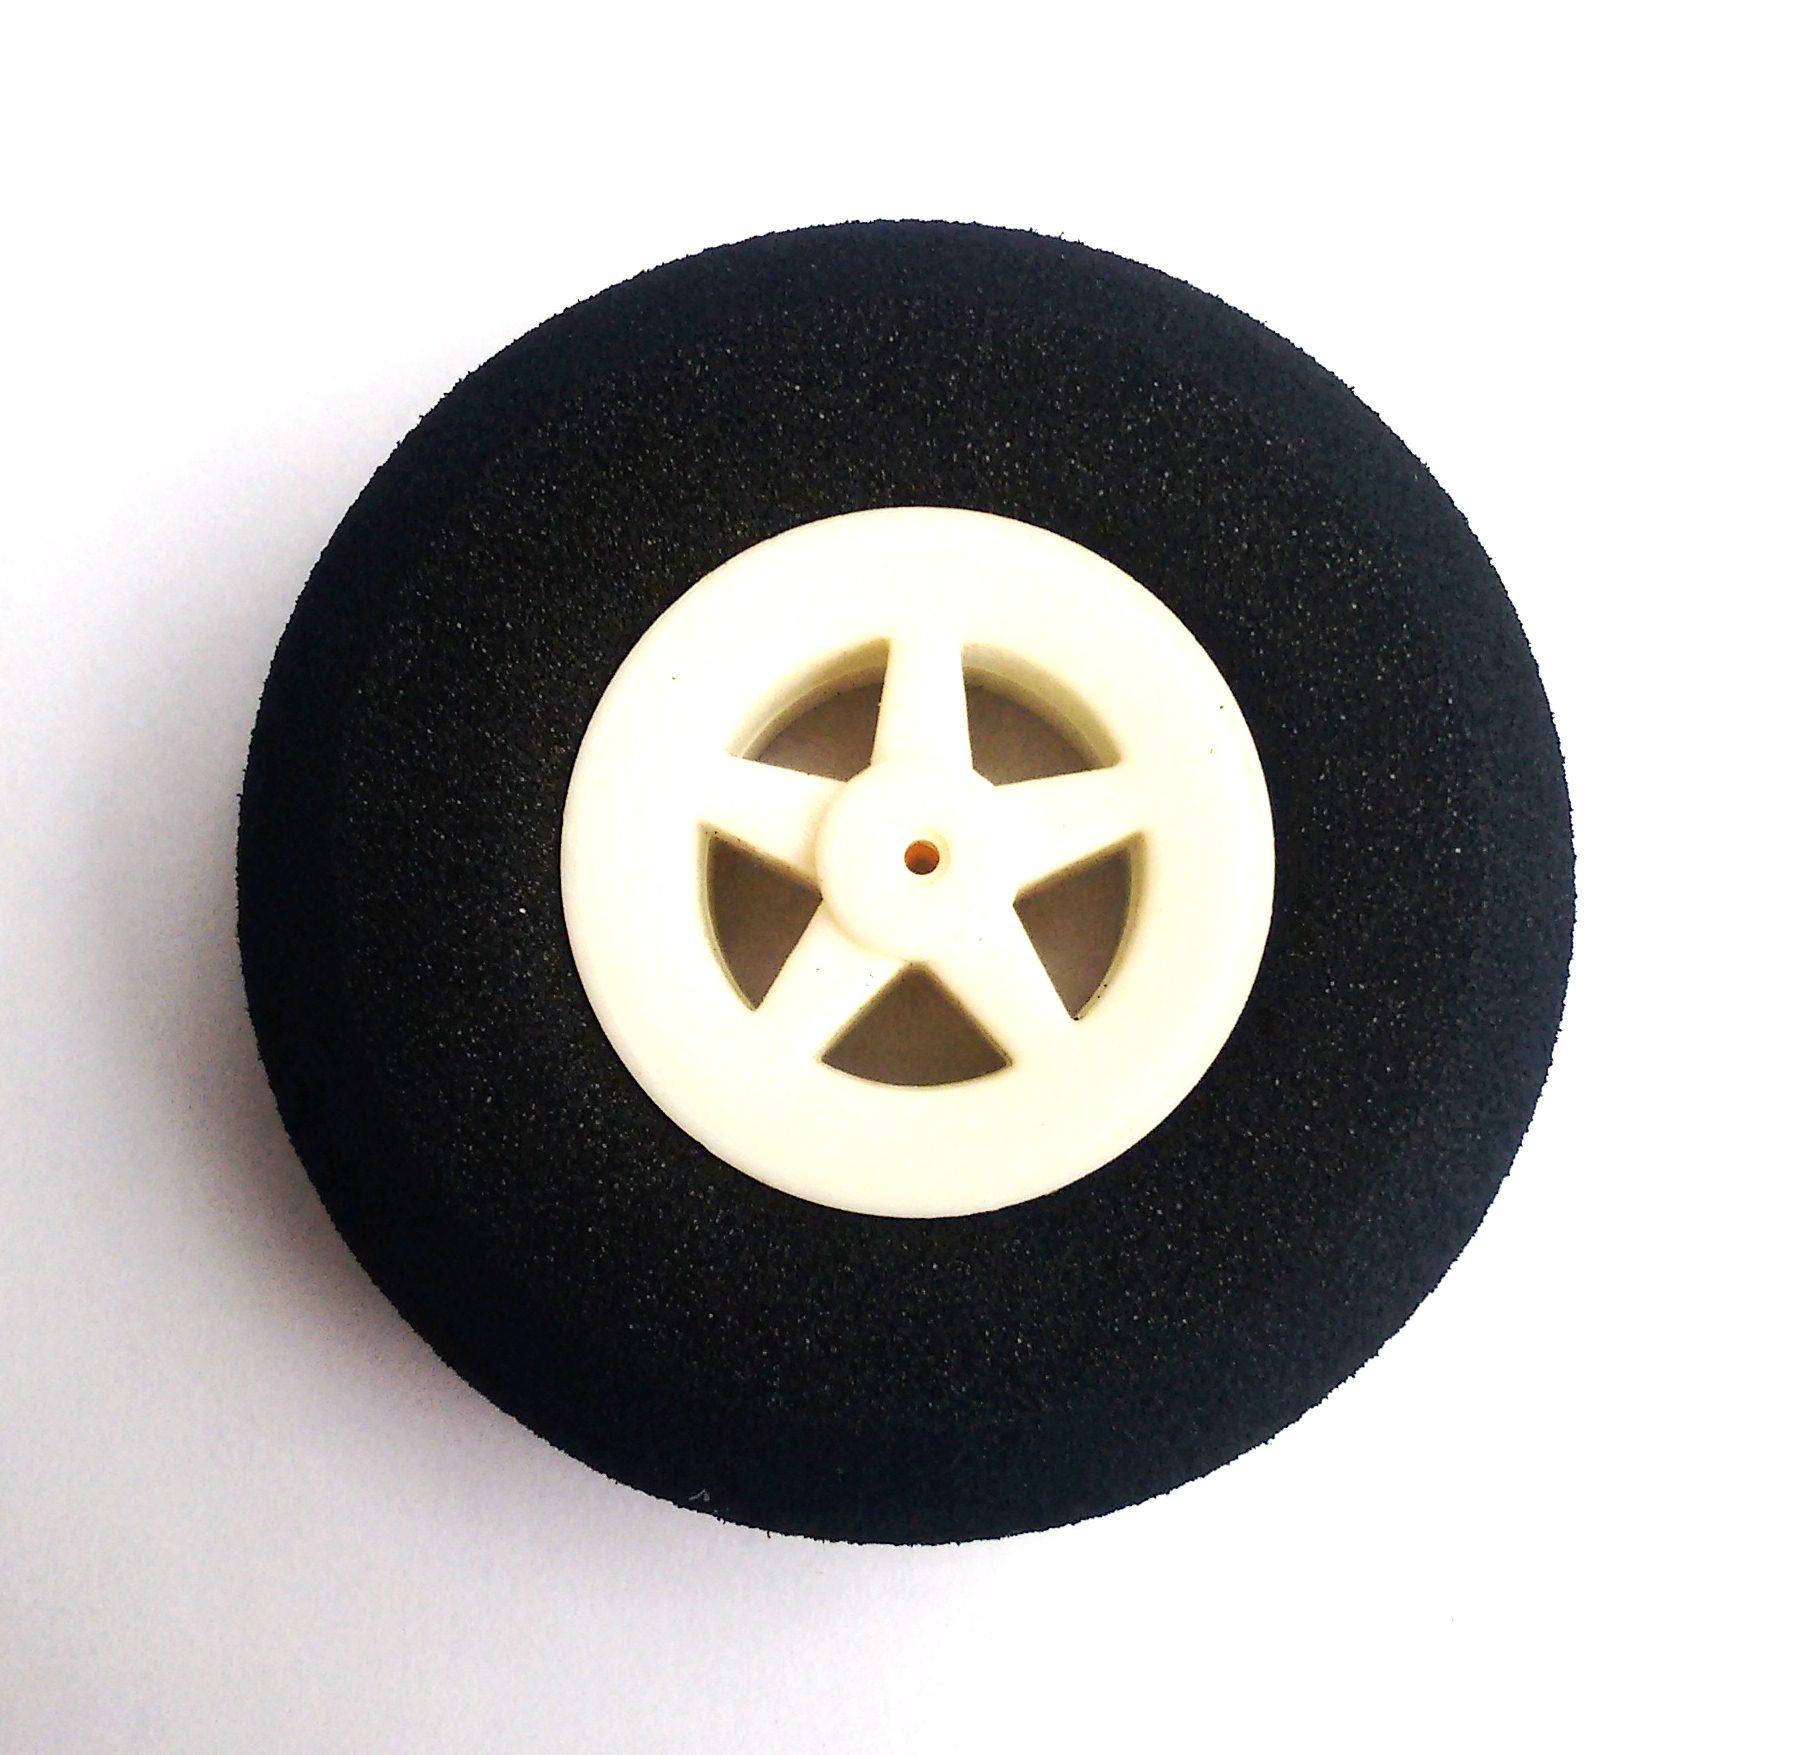 10398 - Roda Light Foam (Diâmetro: 40mm, Largura: 11mm)